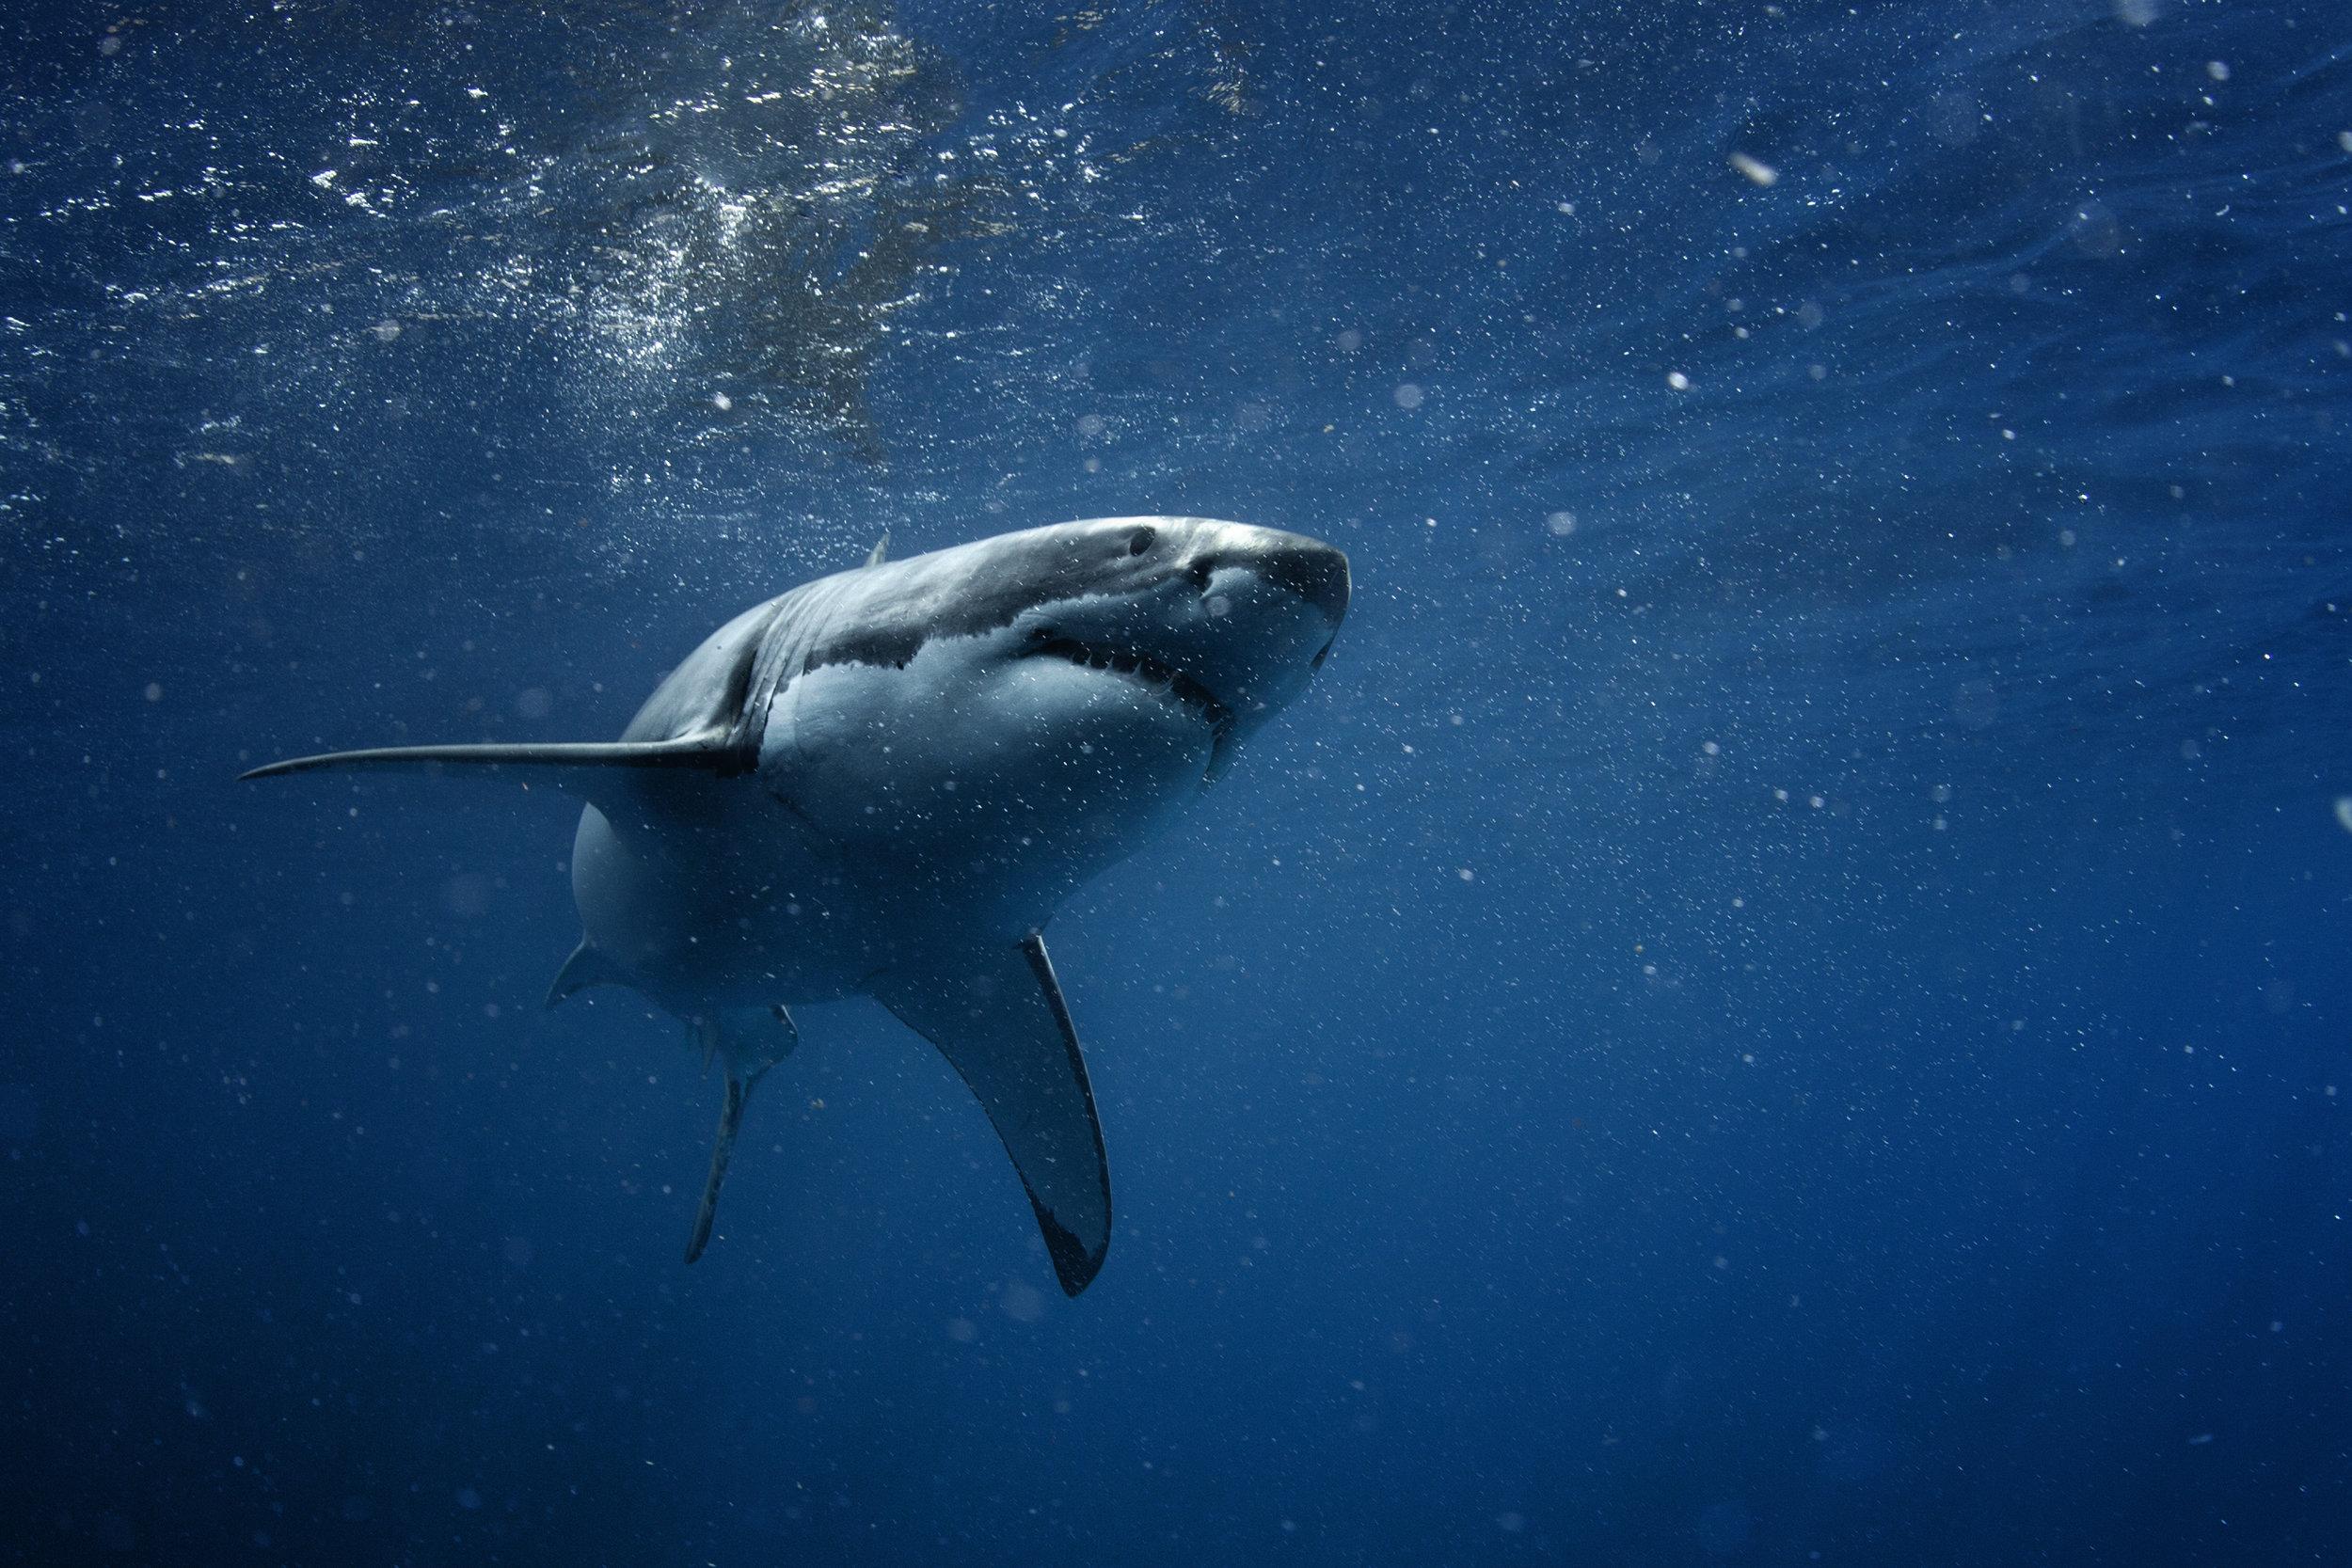 Great White Shark in blue ocean. Underwater photography. Predator hunting near water surface.